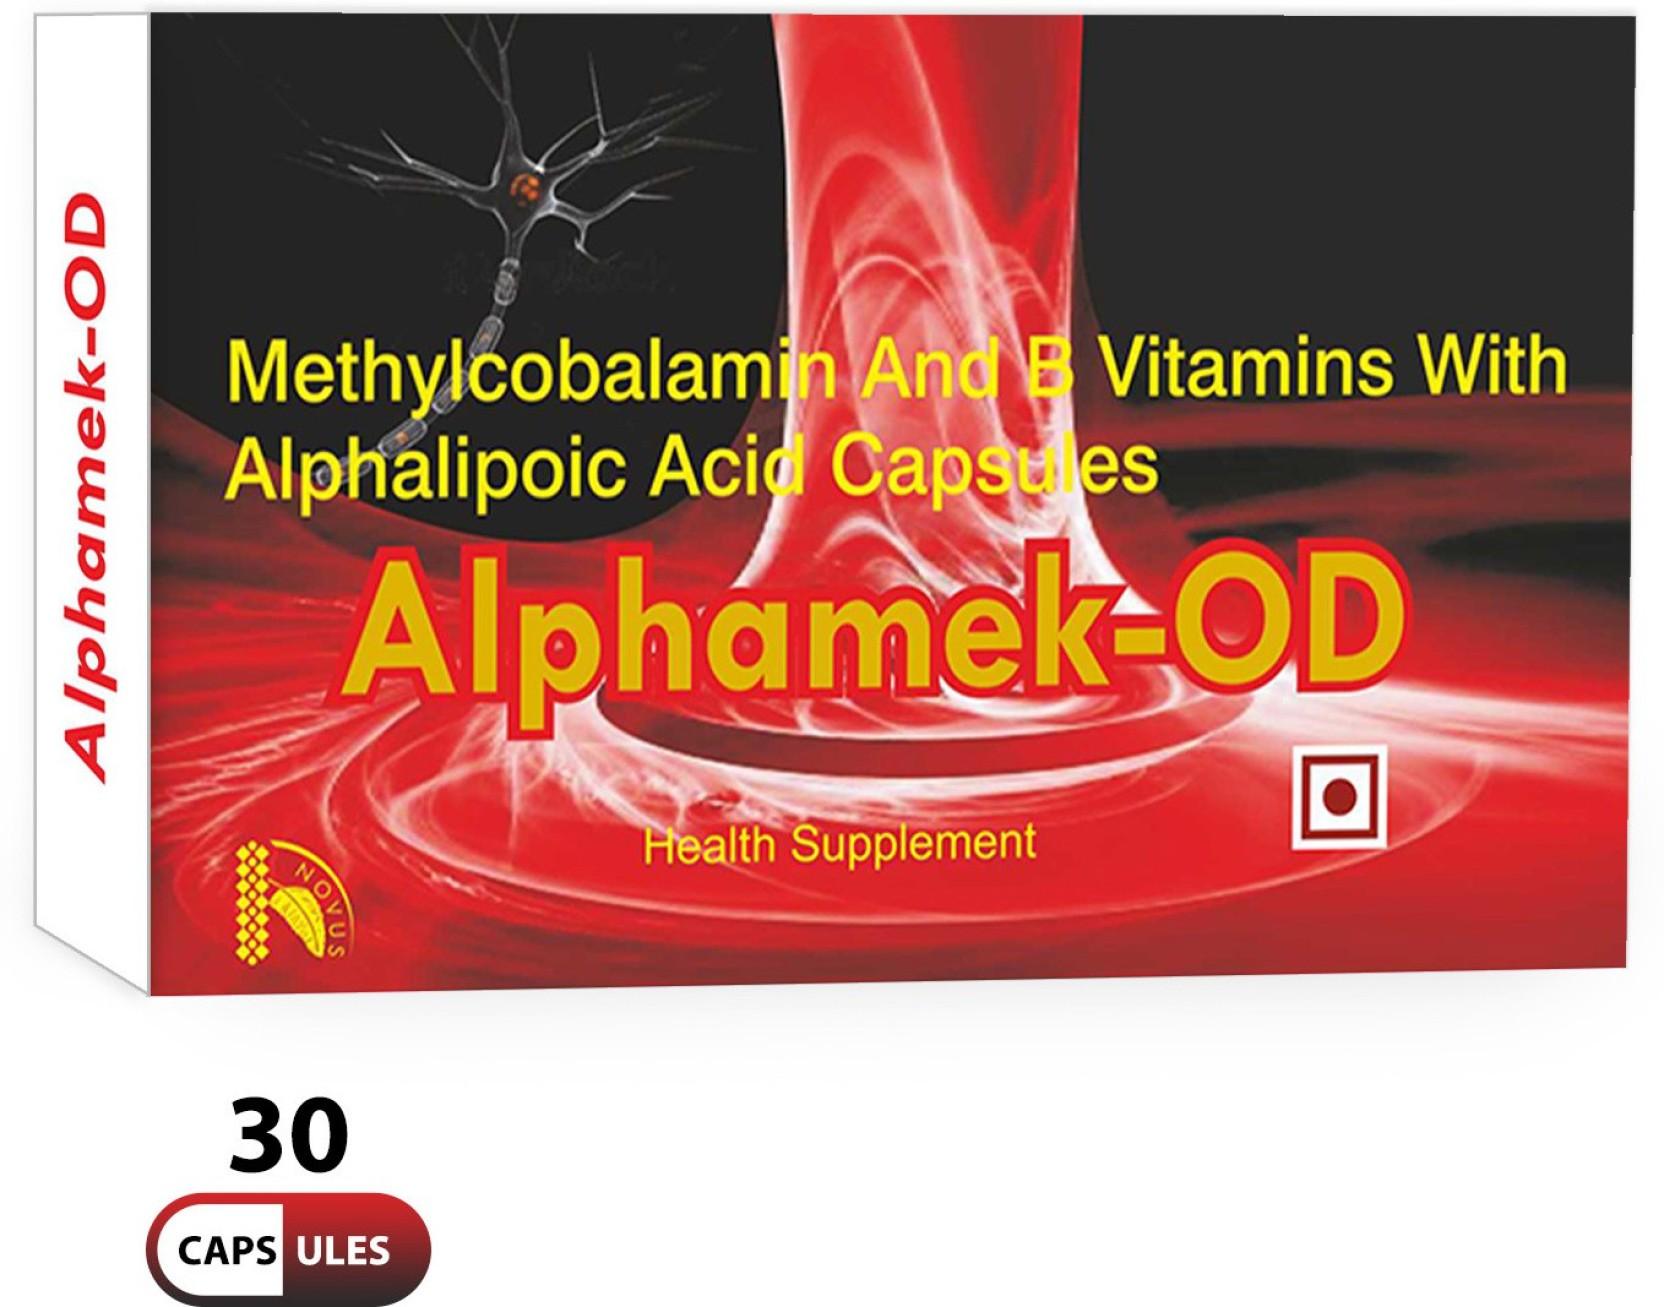 Alphamek OD Vitamin B12 Methylcobalamin 1500mcg ALA Folic Acid